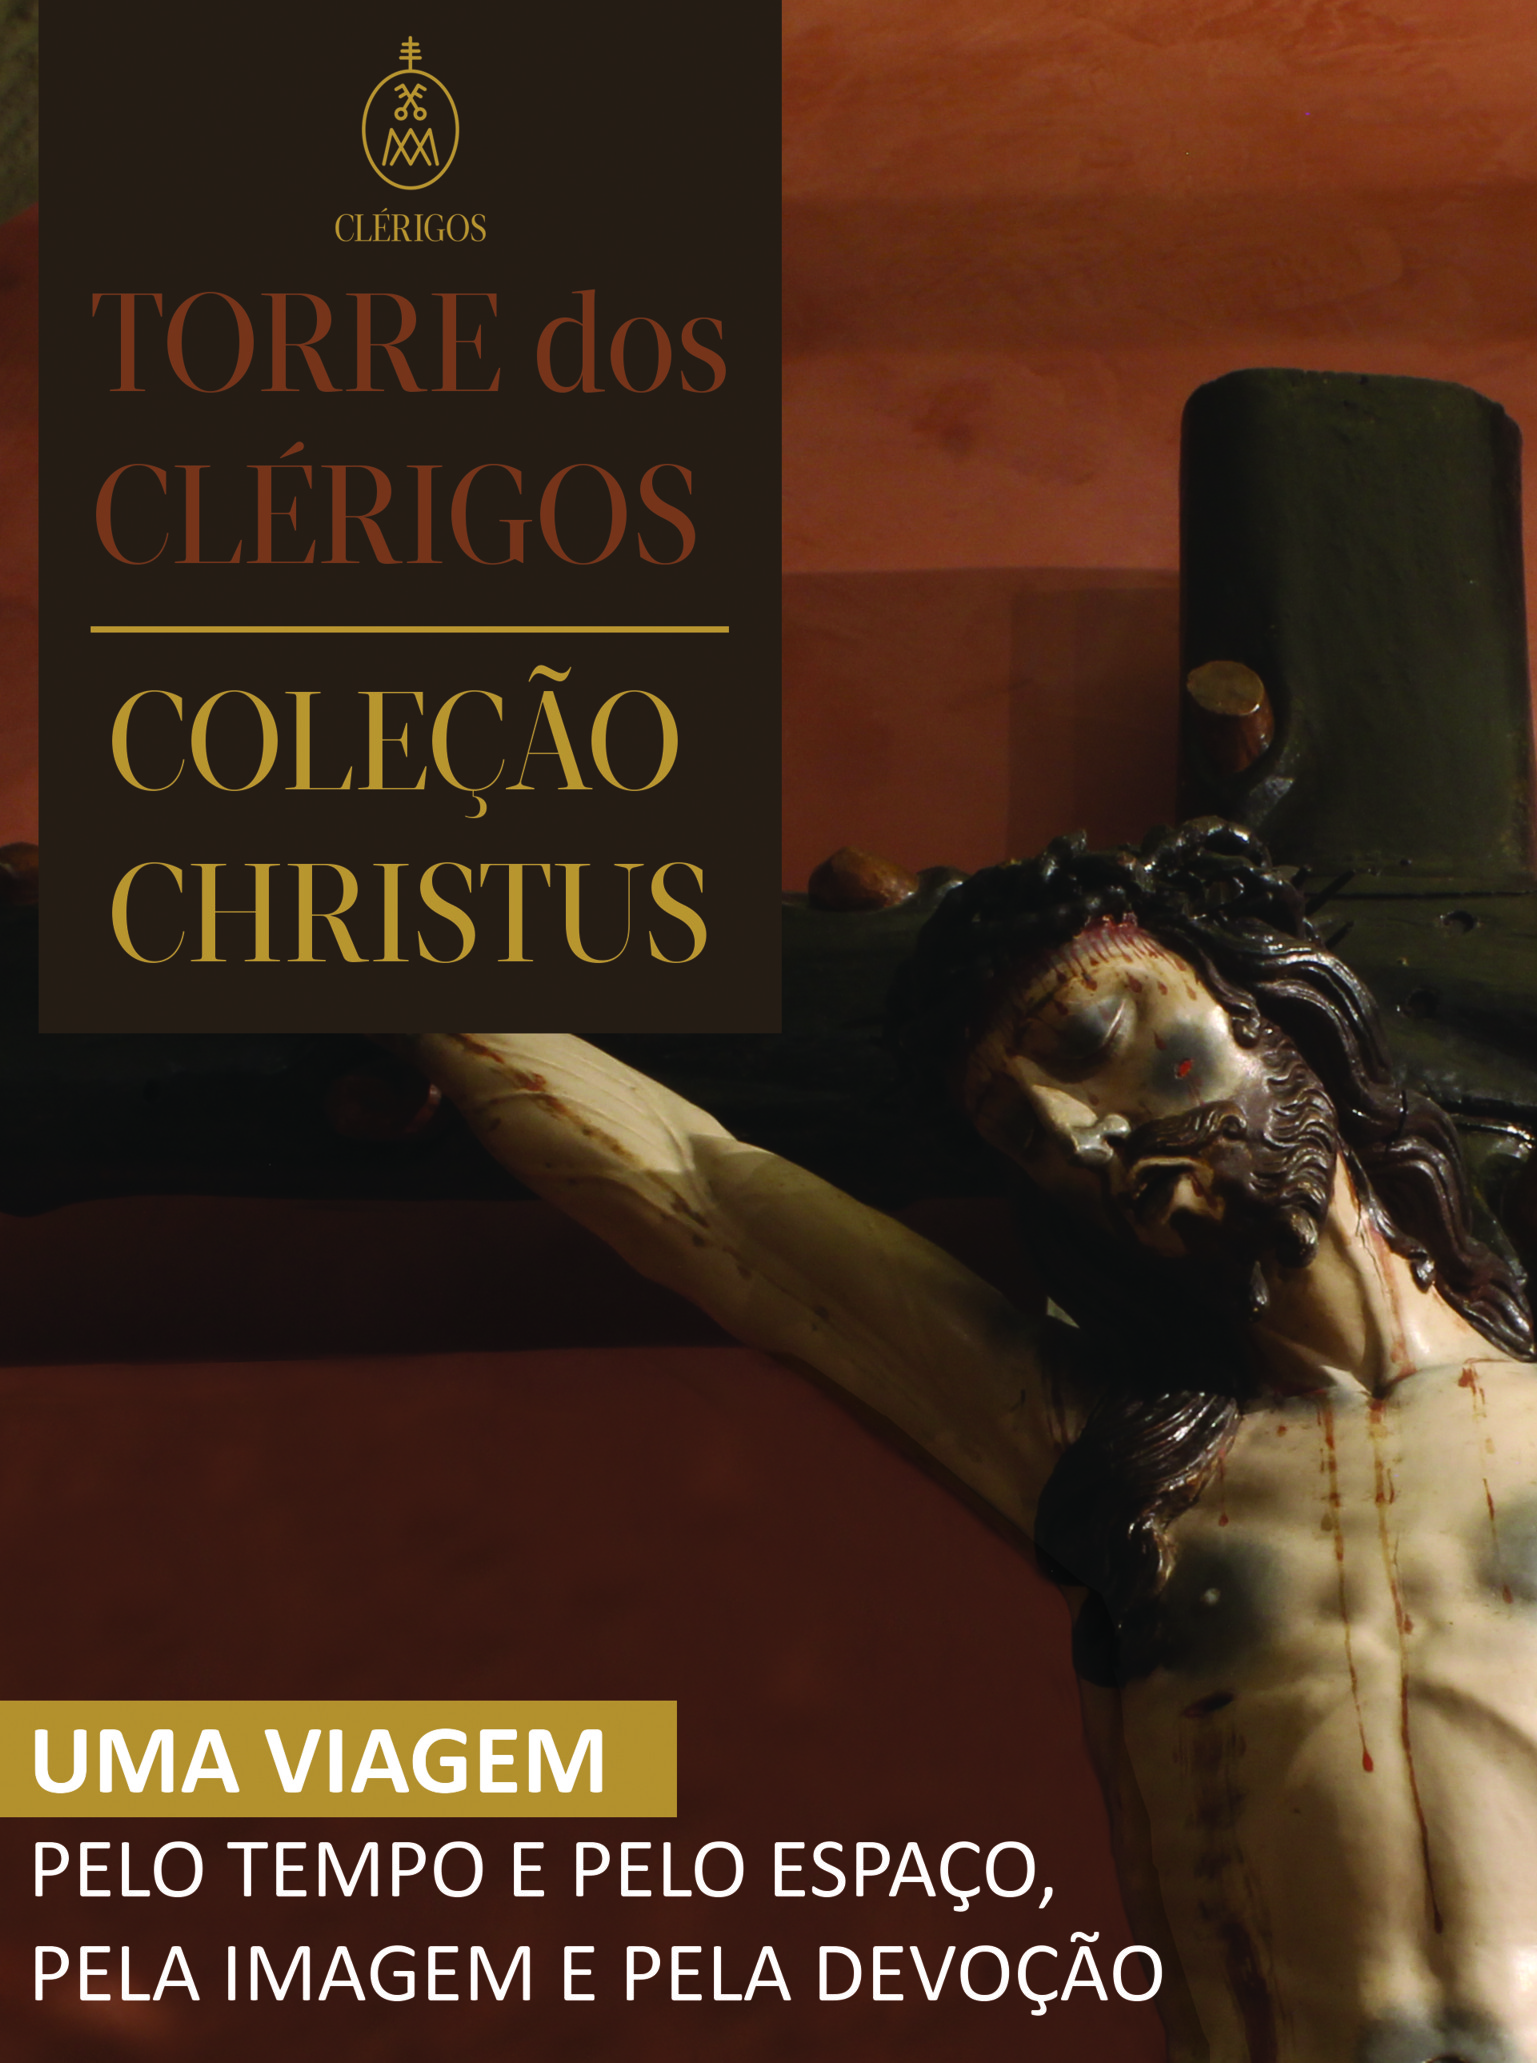 dnbci16 clerigos christus